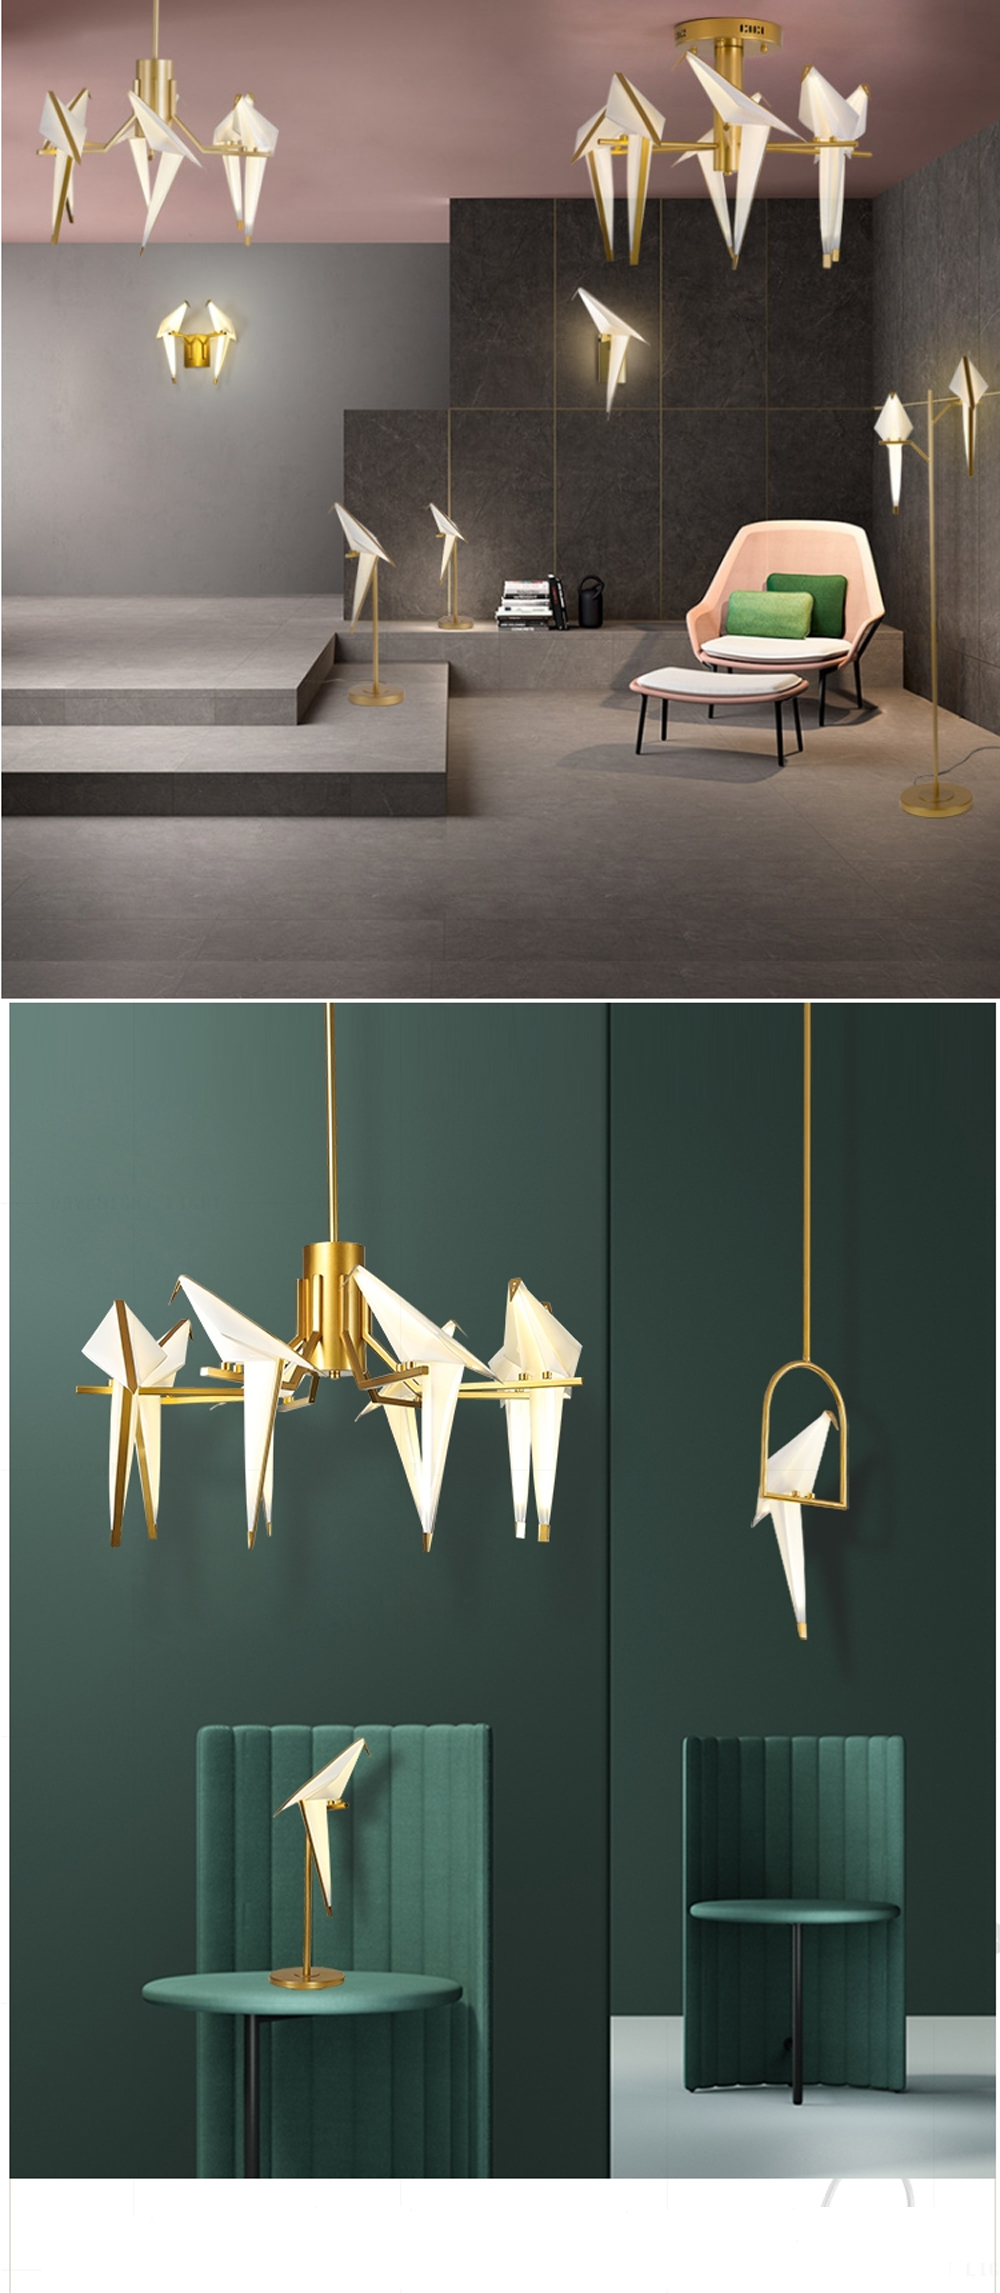 Hcc8a7b4977ed4f87922318ac88aa7aabQ - LED Postmodern Iron Acryl Love Bird LED Lamp LED Light Wall lamp Wall Light Wall Sconce For Bedroom Corridor